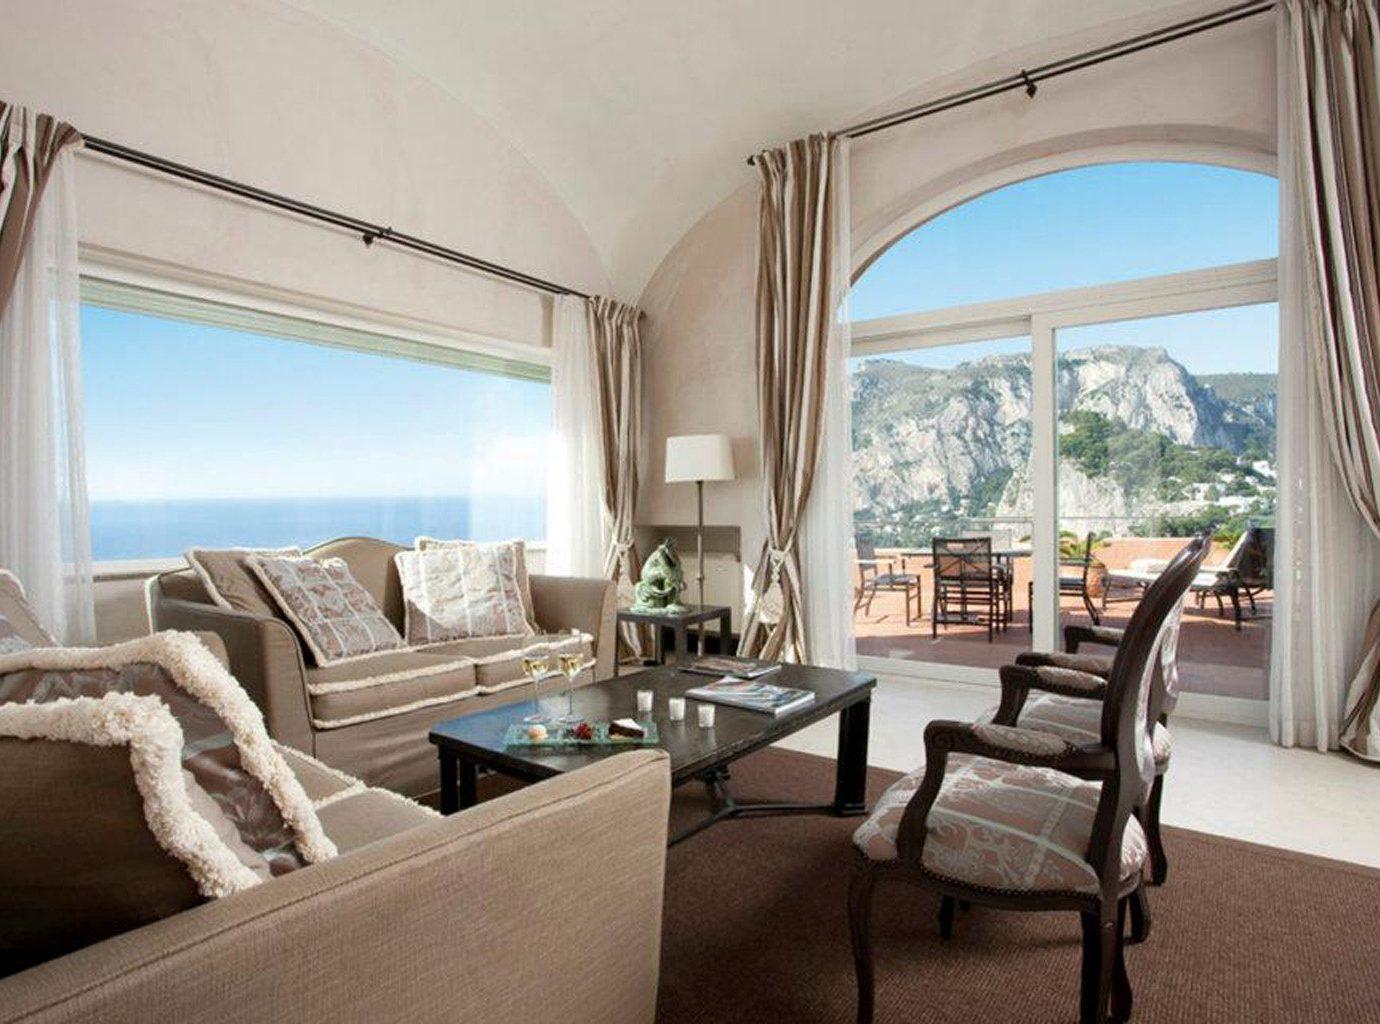 Luxury Suite property living room home Villa condominium mansion Bedroom Resort cottage overlooking